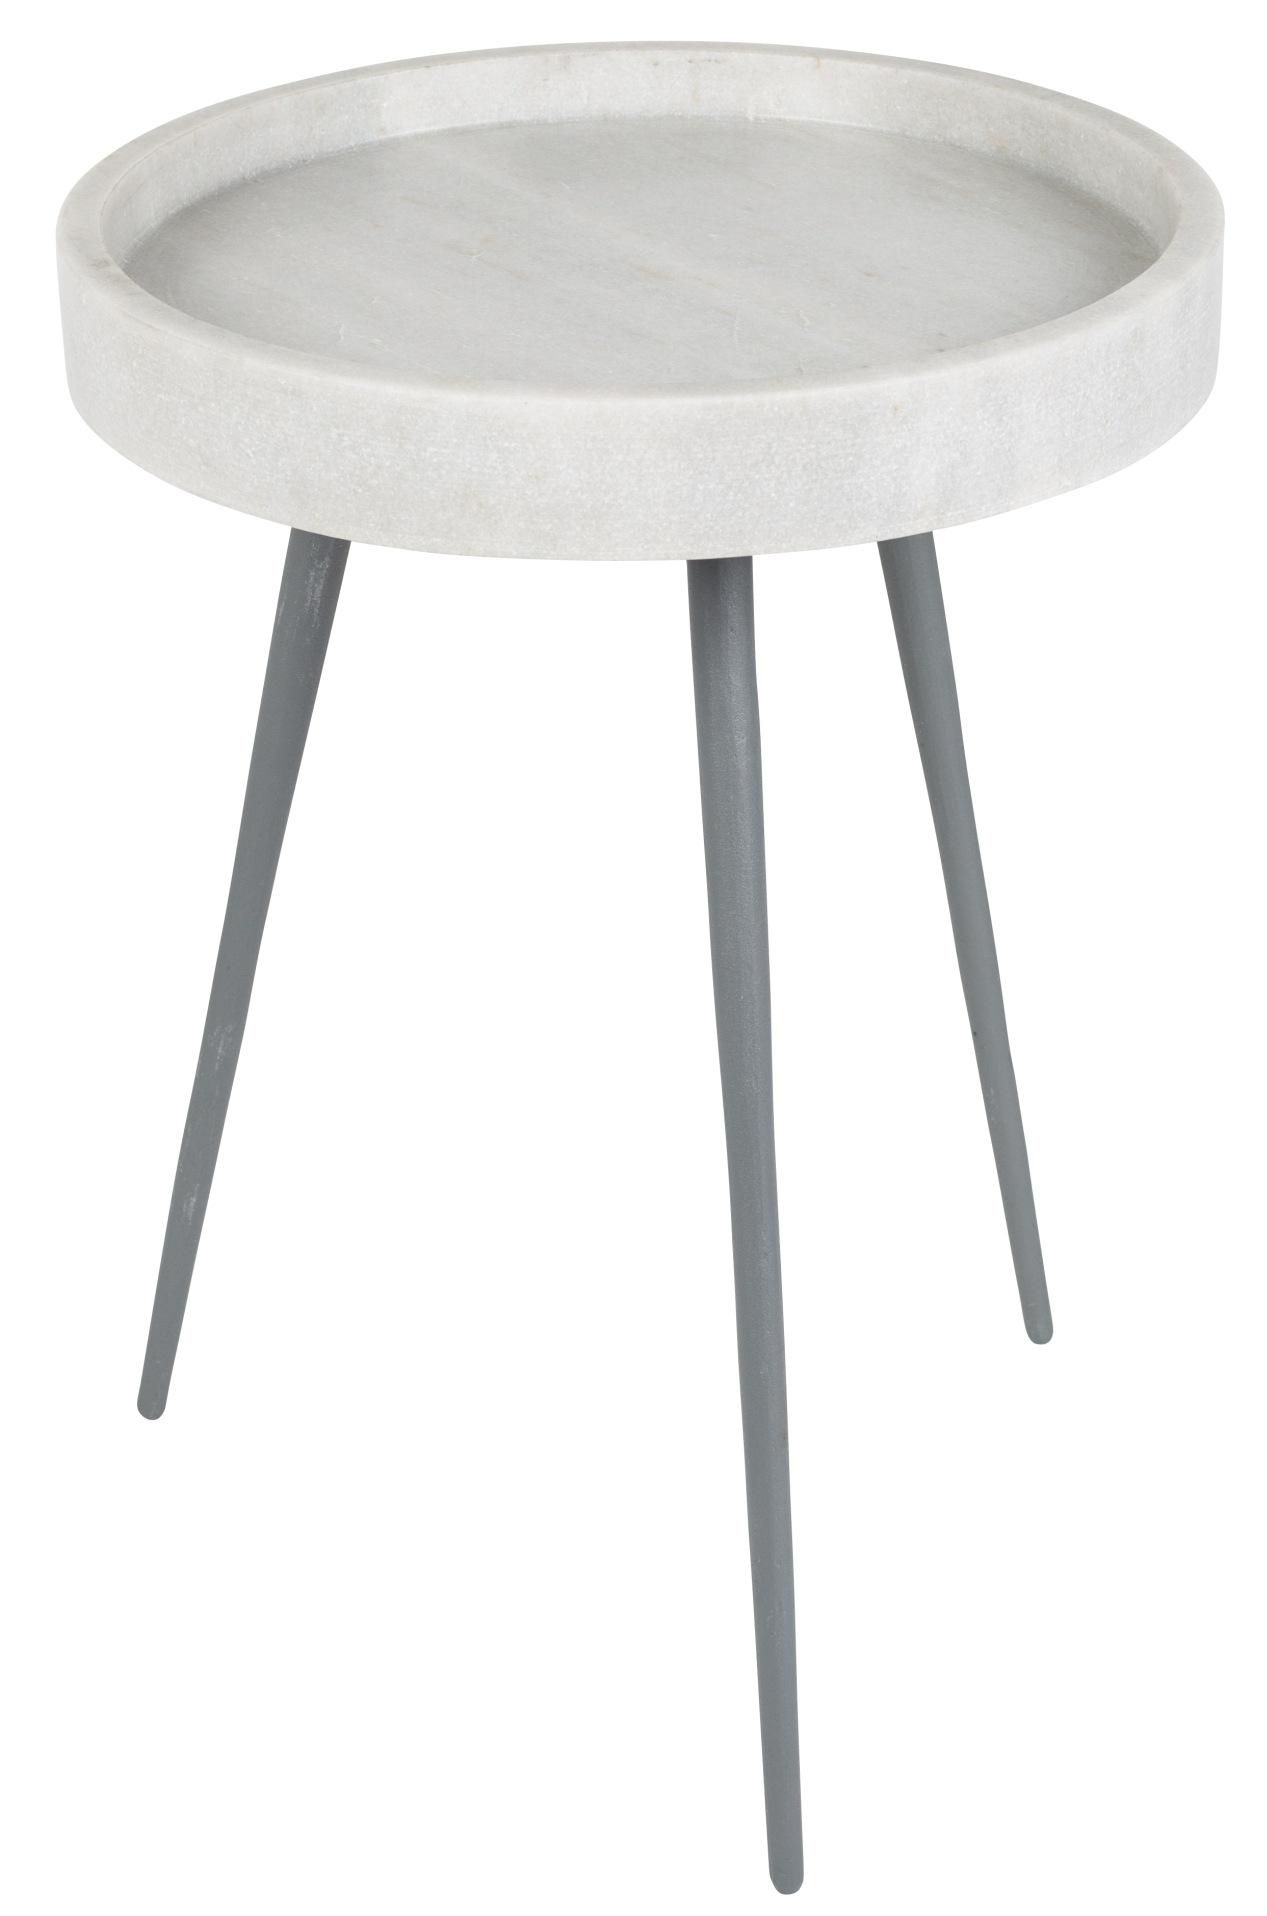 Zuiver Bijzettafel Karrara -Ø33 X H45 Cm - Marmer - Wit